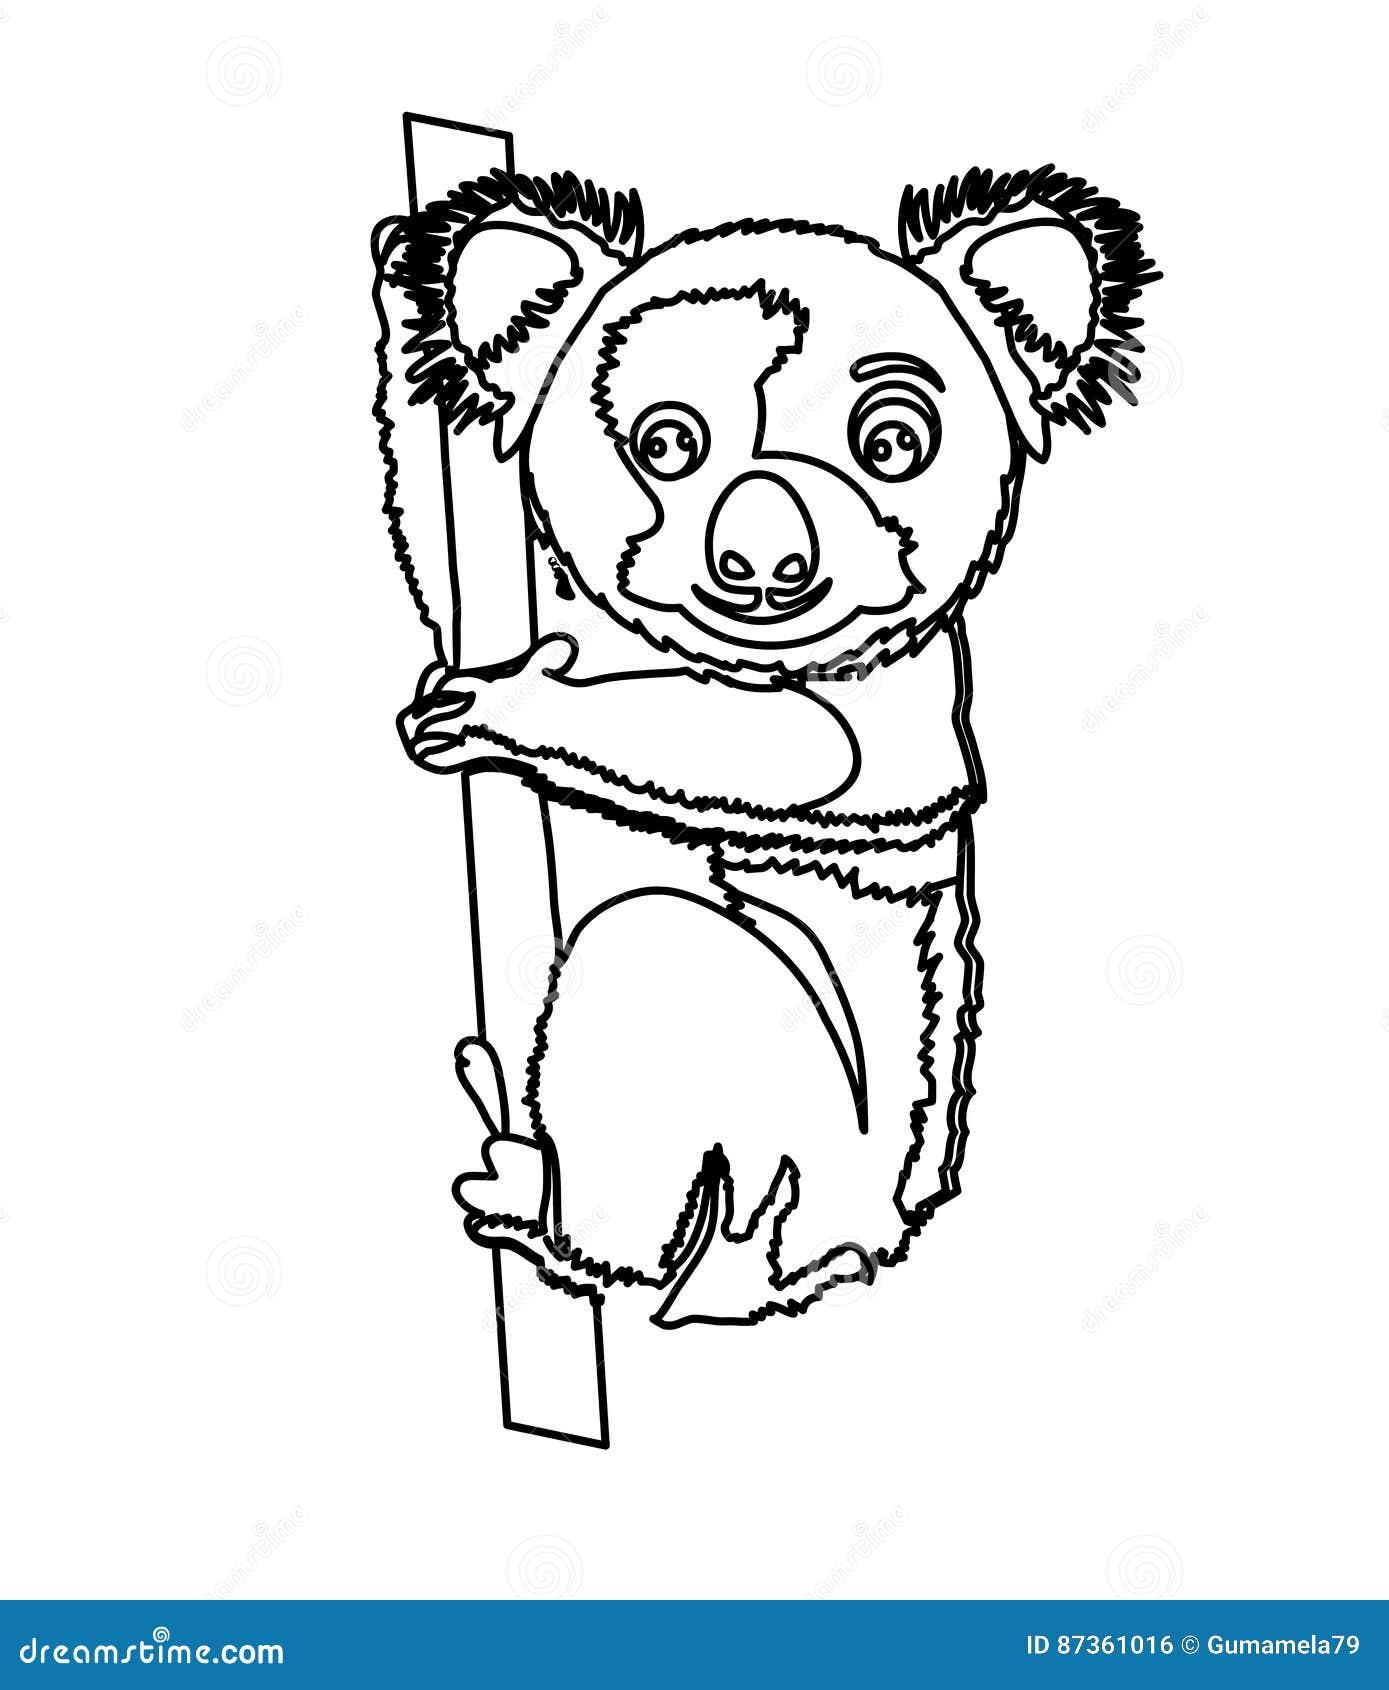 Koala coloring page stock illustration. Illustration of game - 87361016